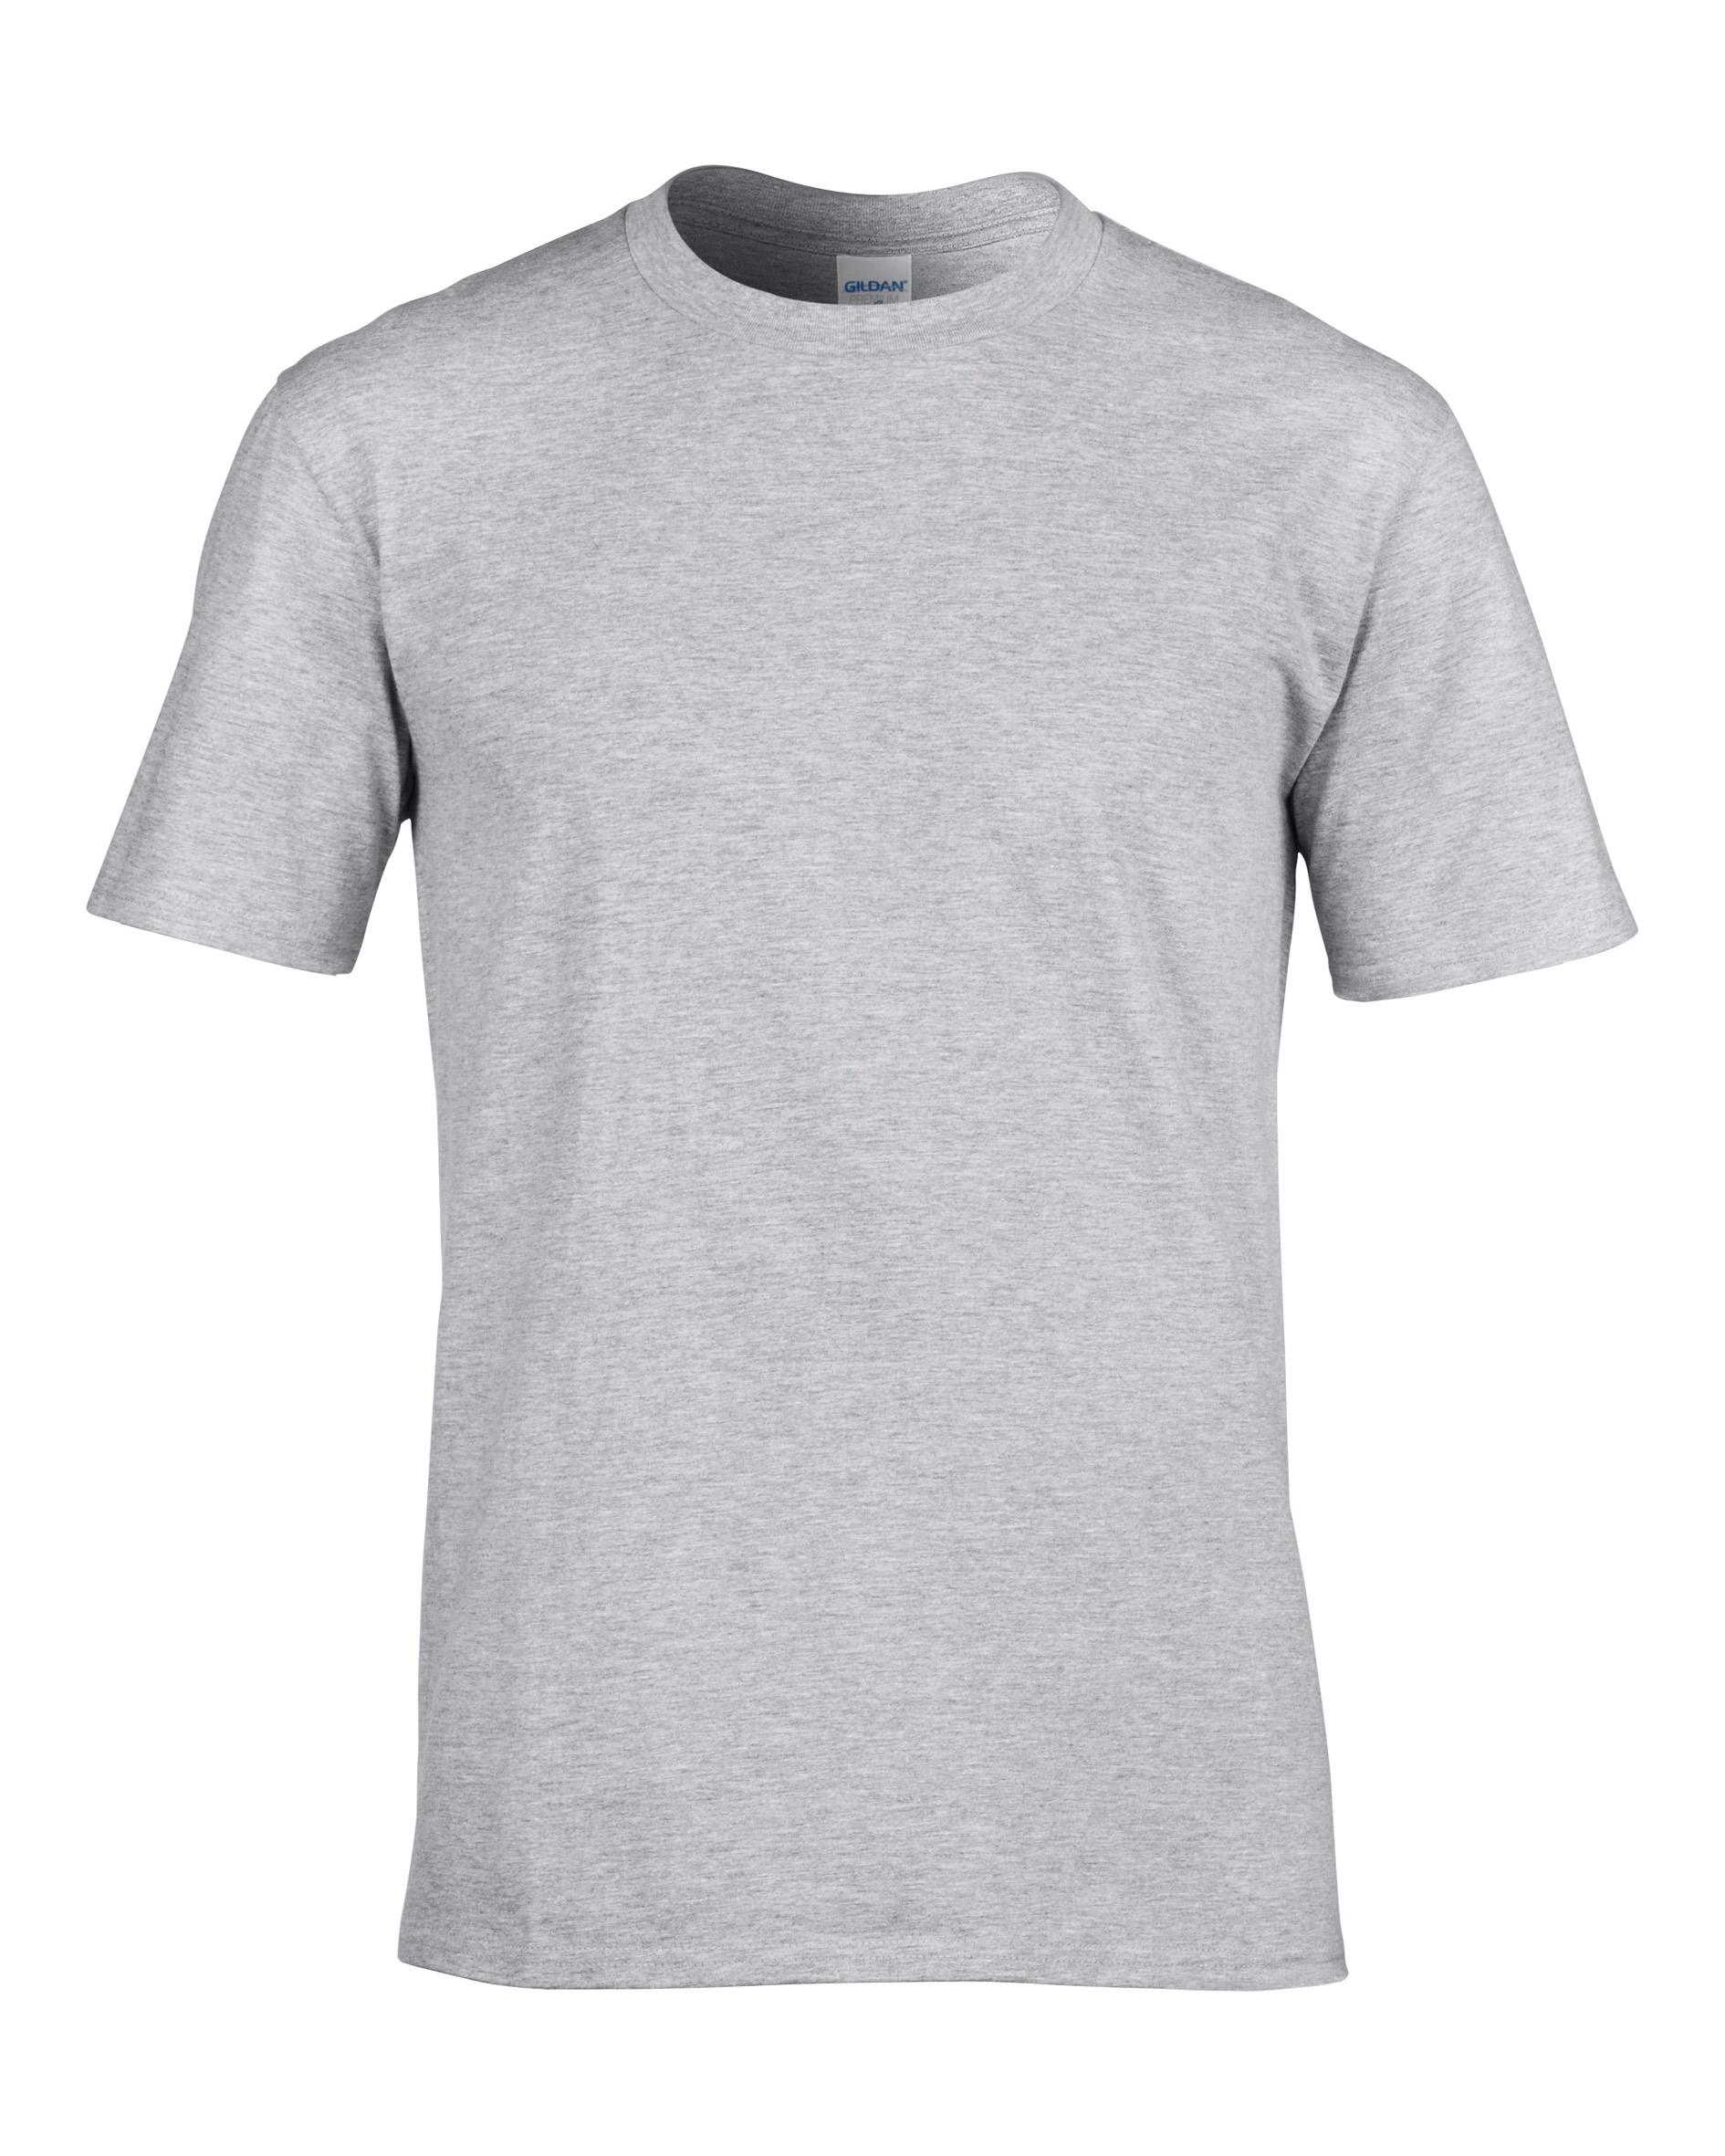 Gildan Premium Cotton Ring Spun T-Shirt 65446b8533